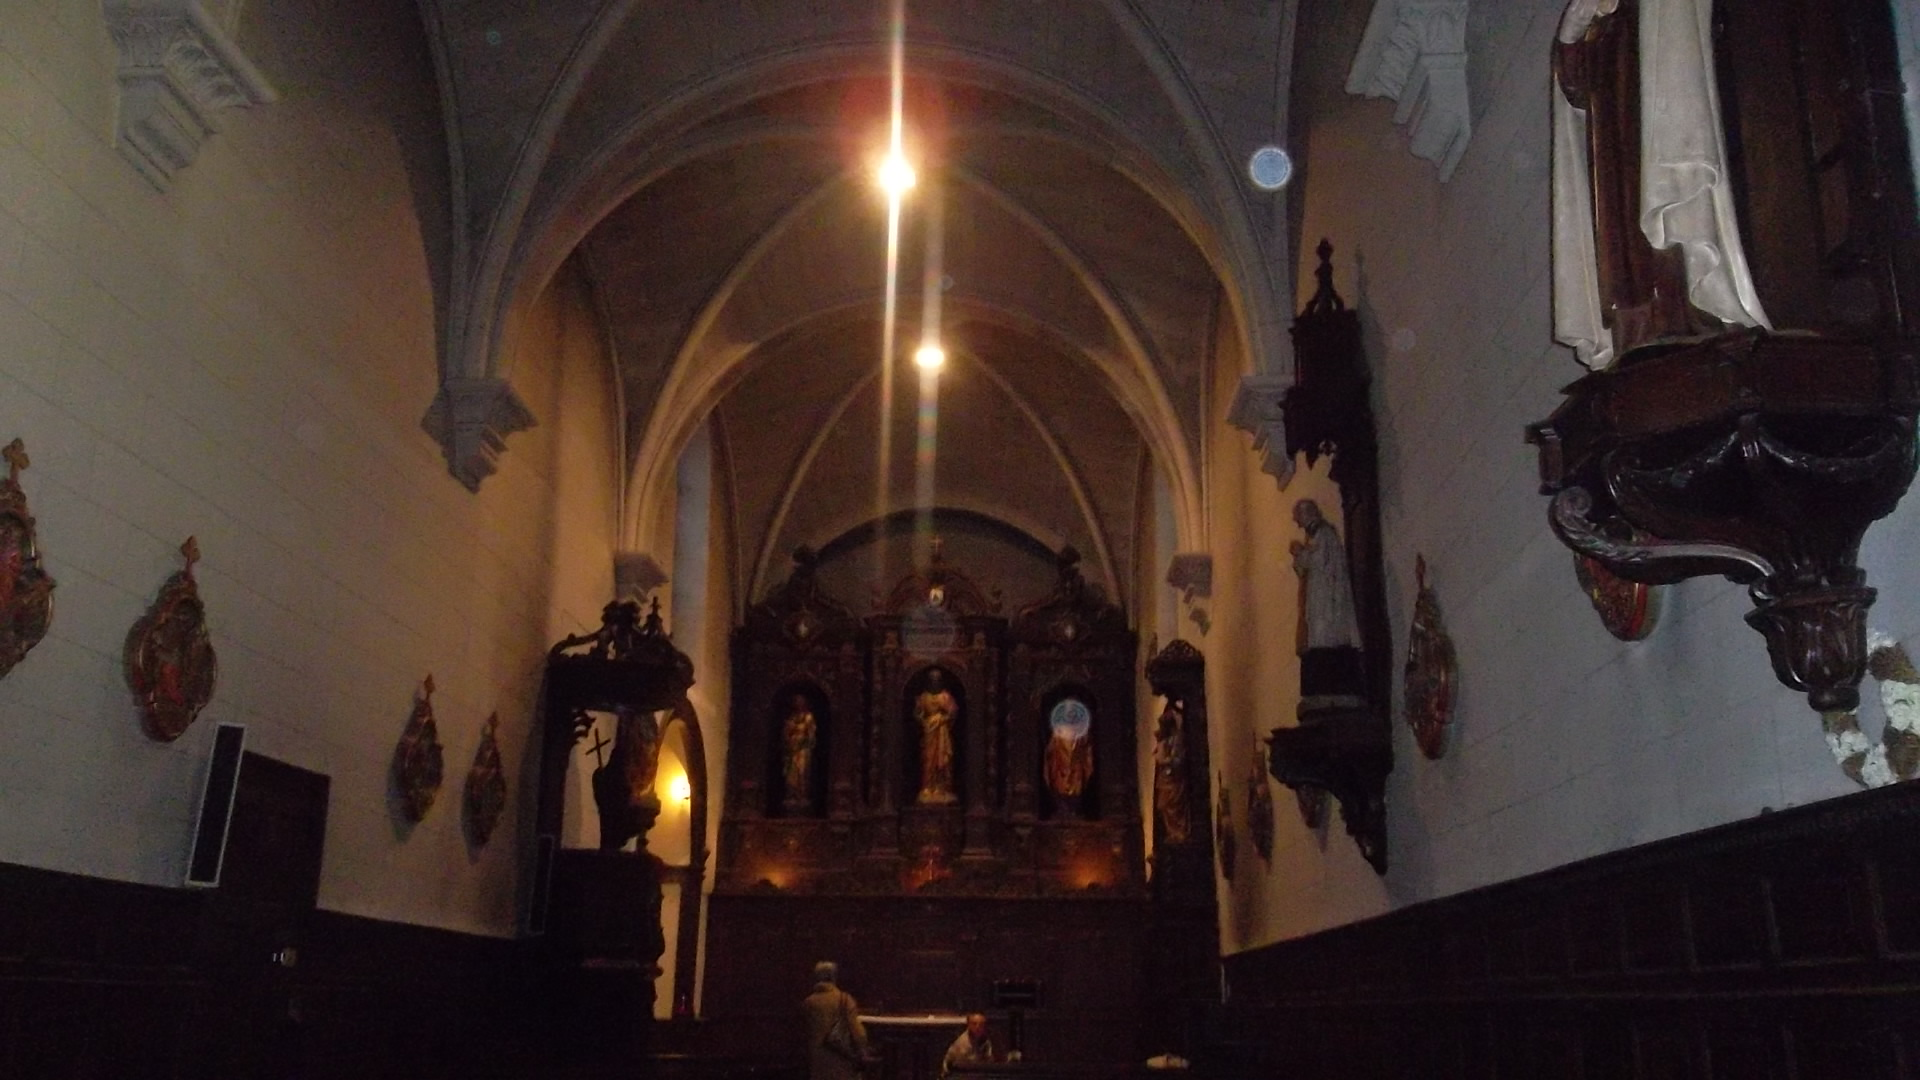 Auray chapelle St Helene hotel dieu inside jul13